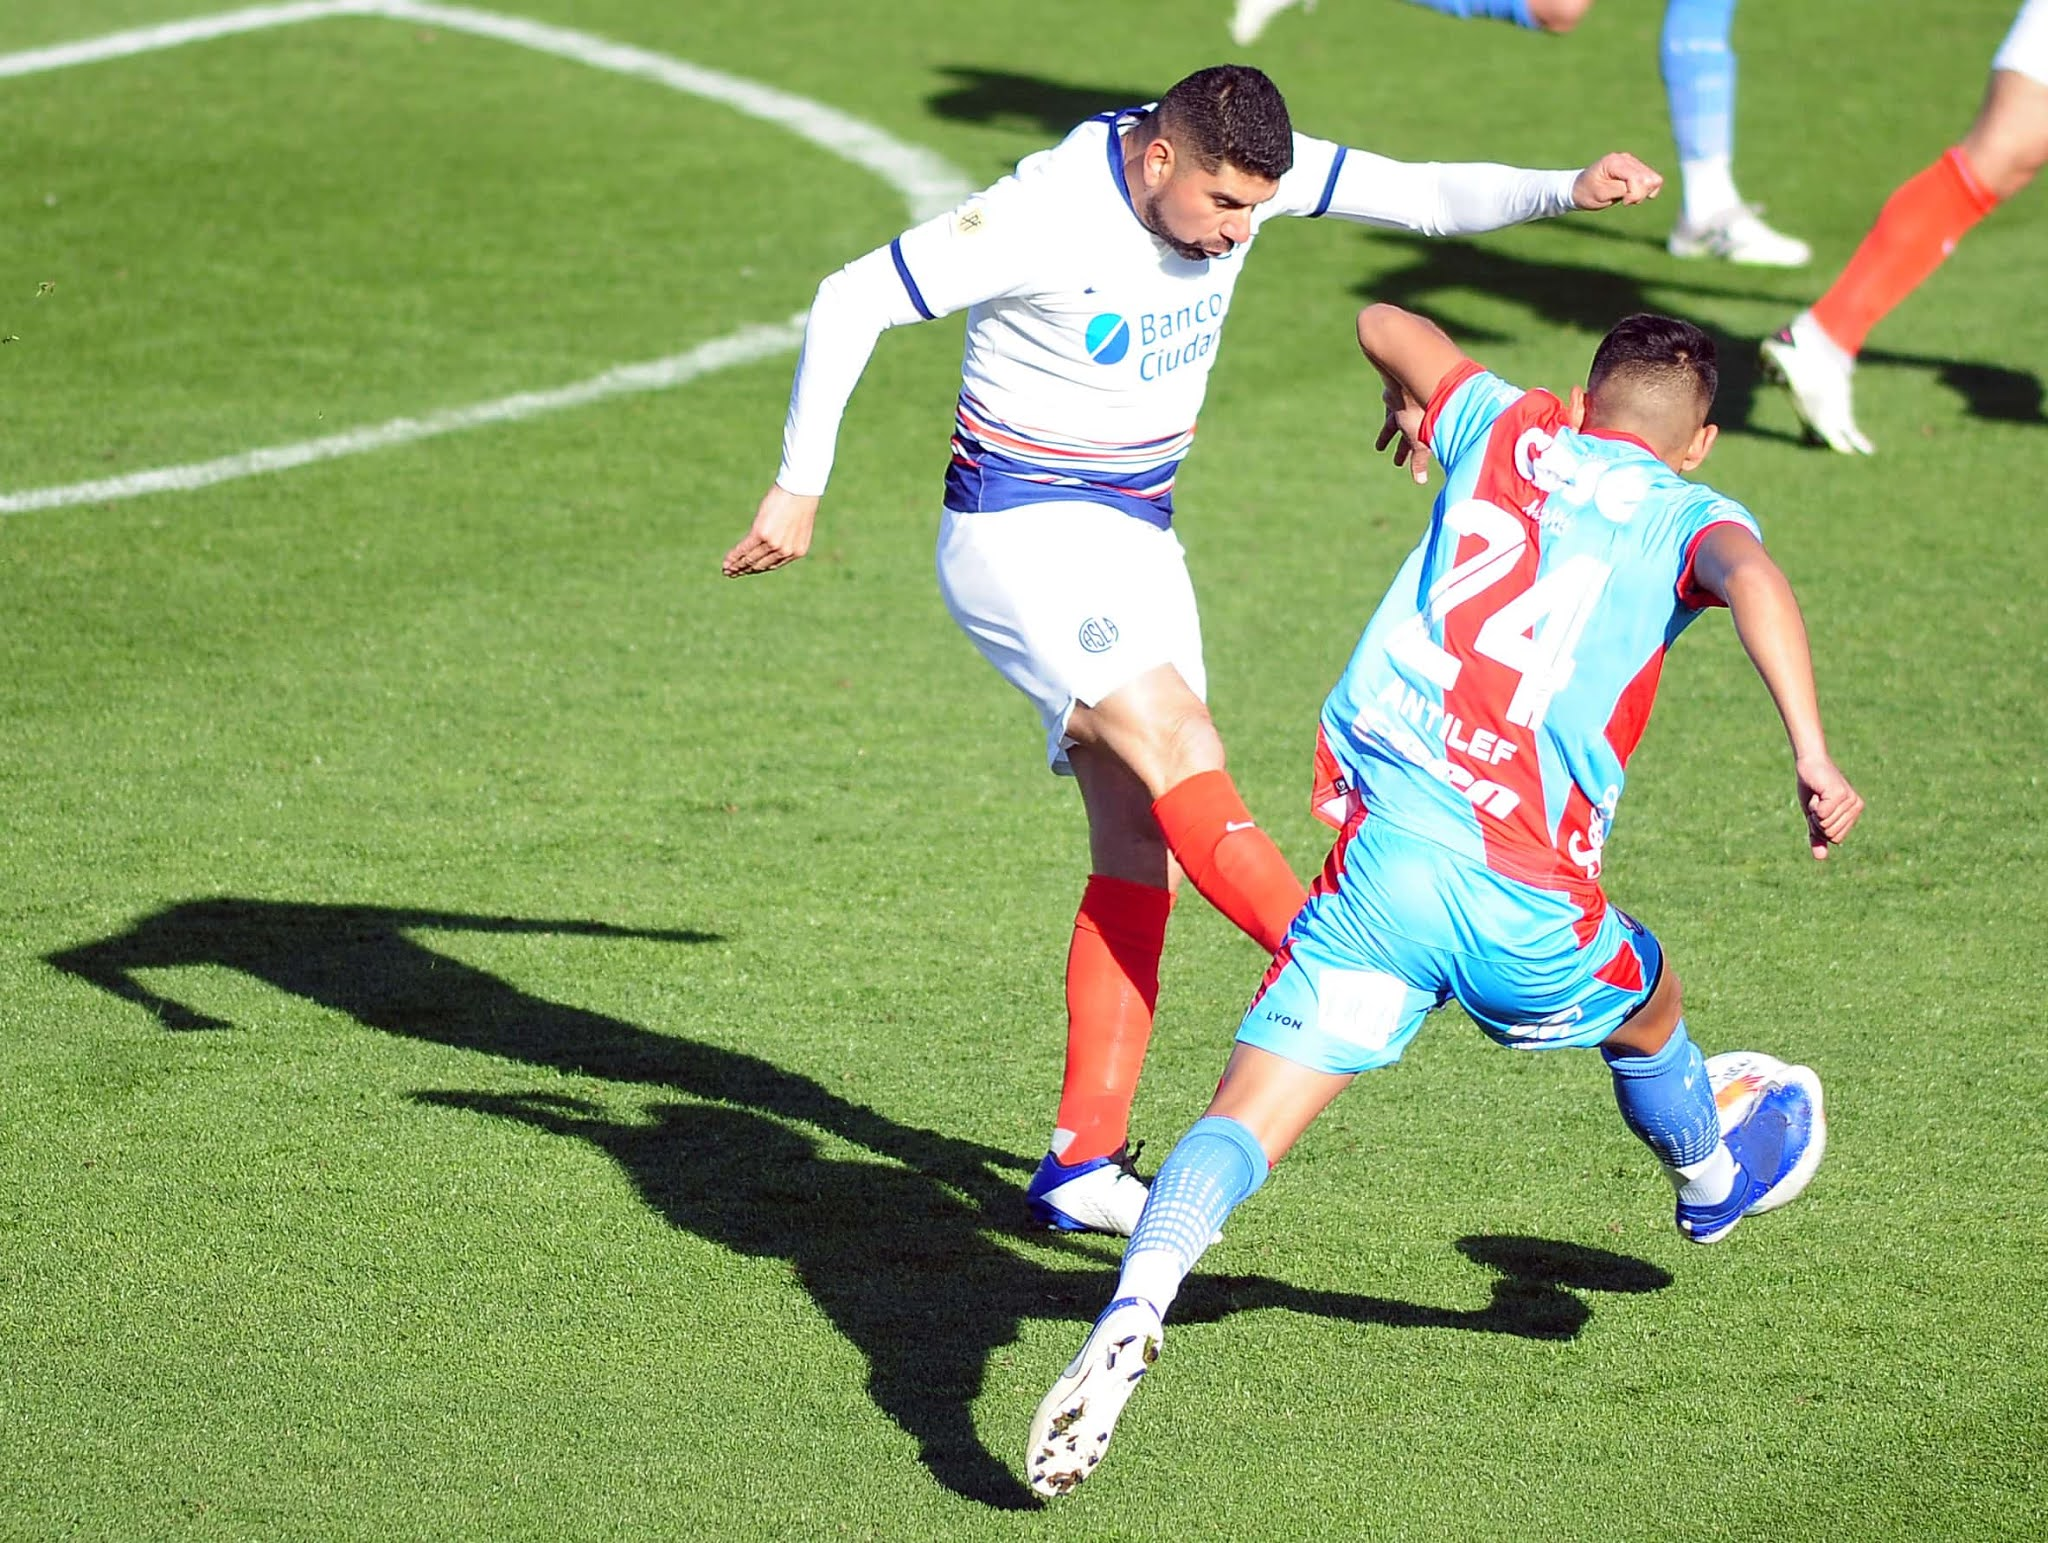 San Lorenzo empató en su visita en Sarandí ante Arsenal